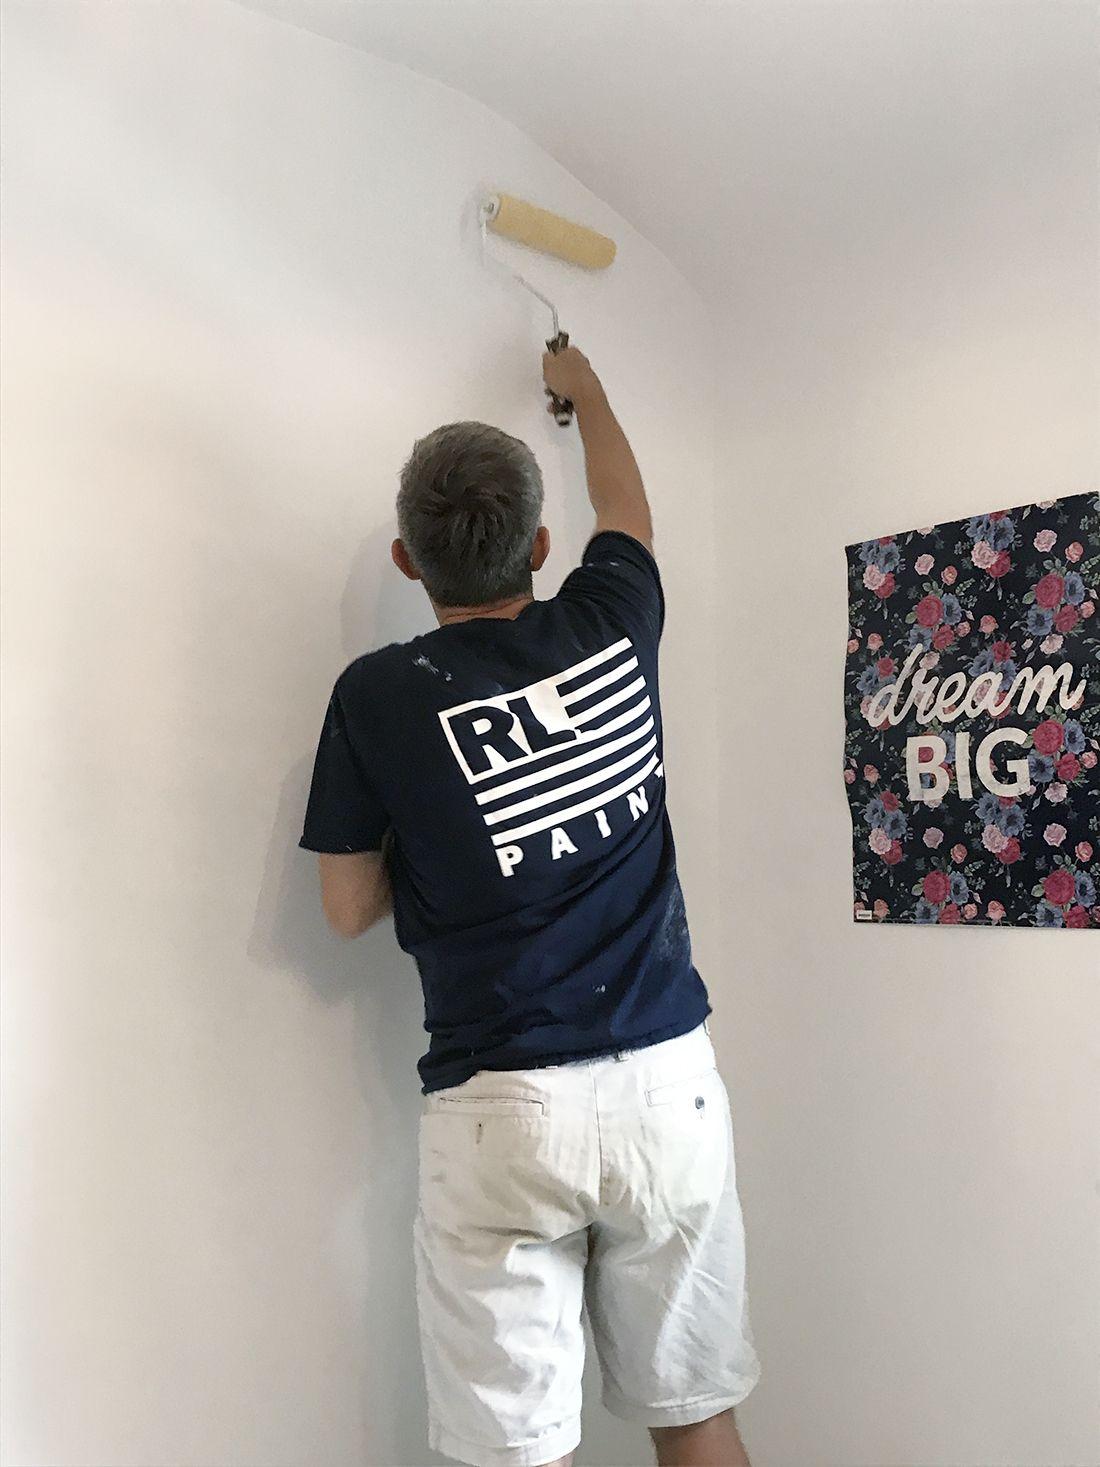 Rambling Renovators Paste The Wall Wallpaper Tips Wall Wallpaper Wallpapering Tips How To Install Wallpaper